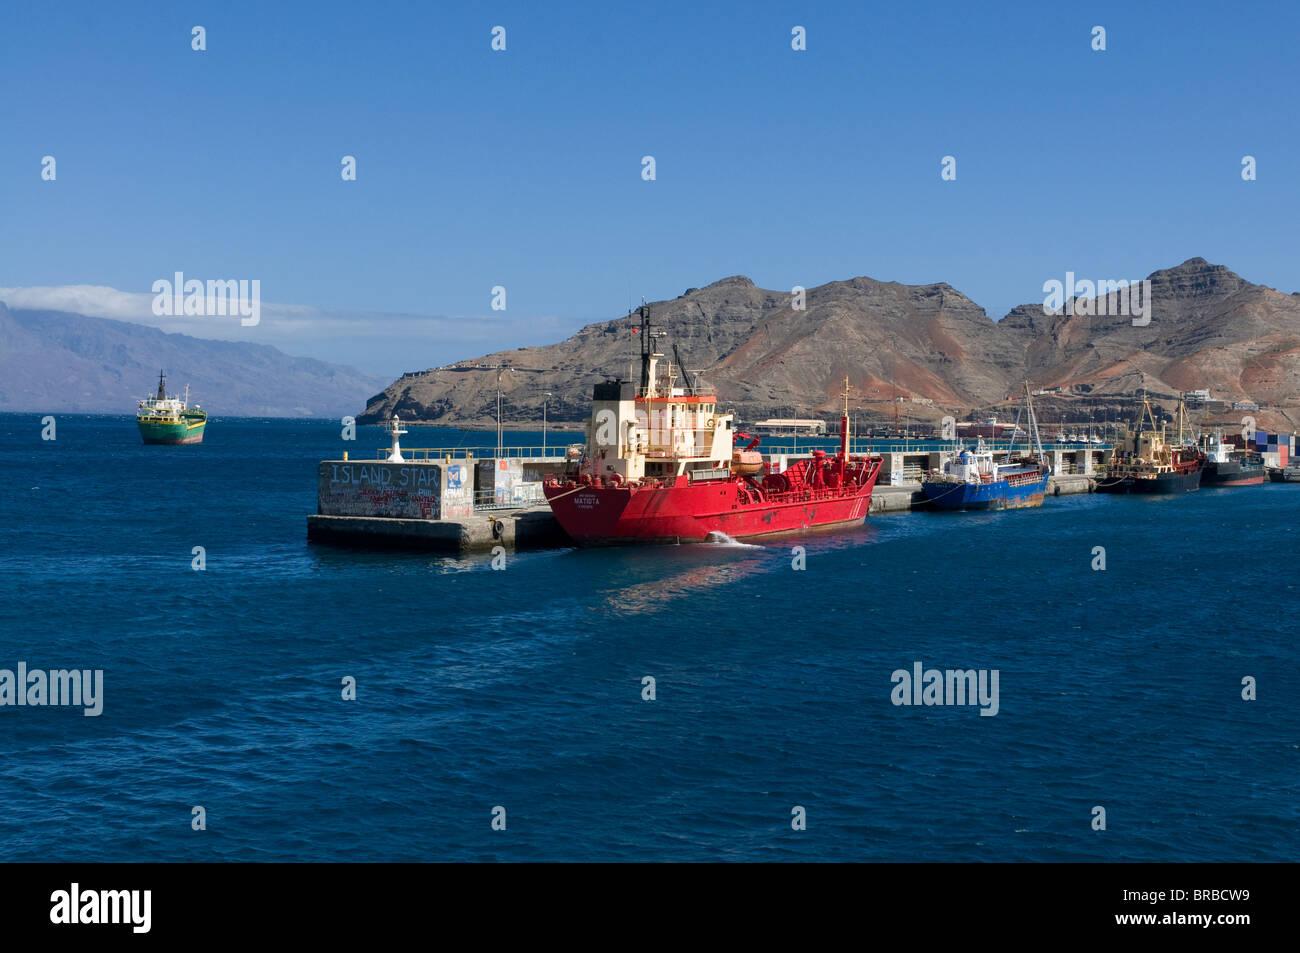 Cargo ship in harbor, Mindelo, Sao Vicente, Cape Verde - Stock Image